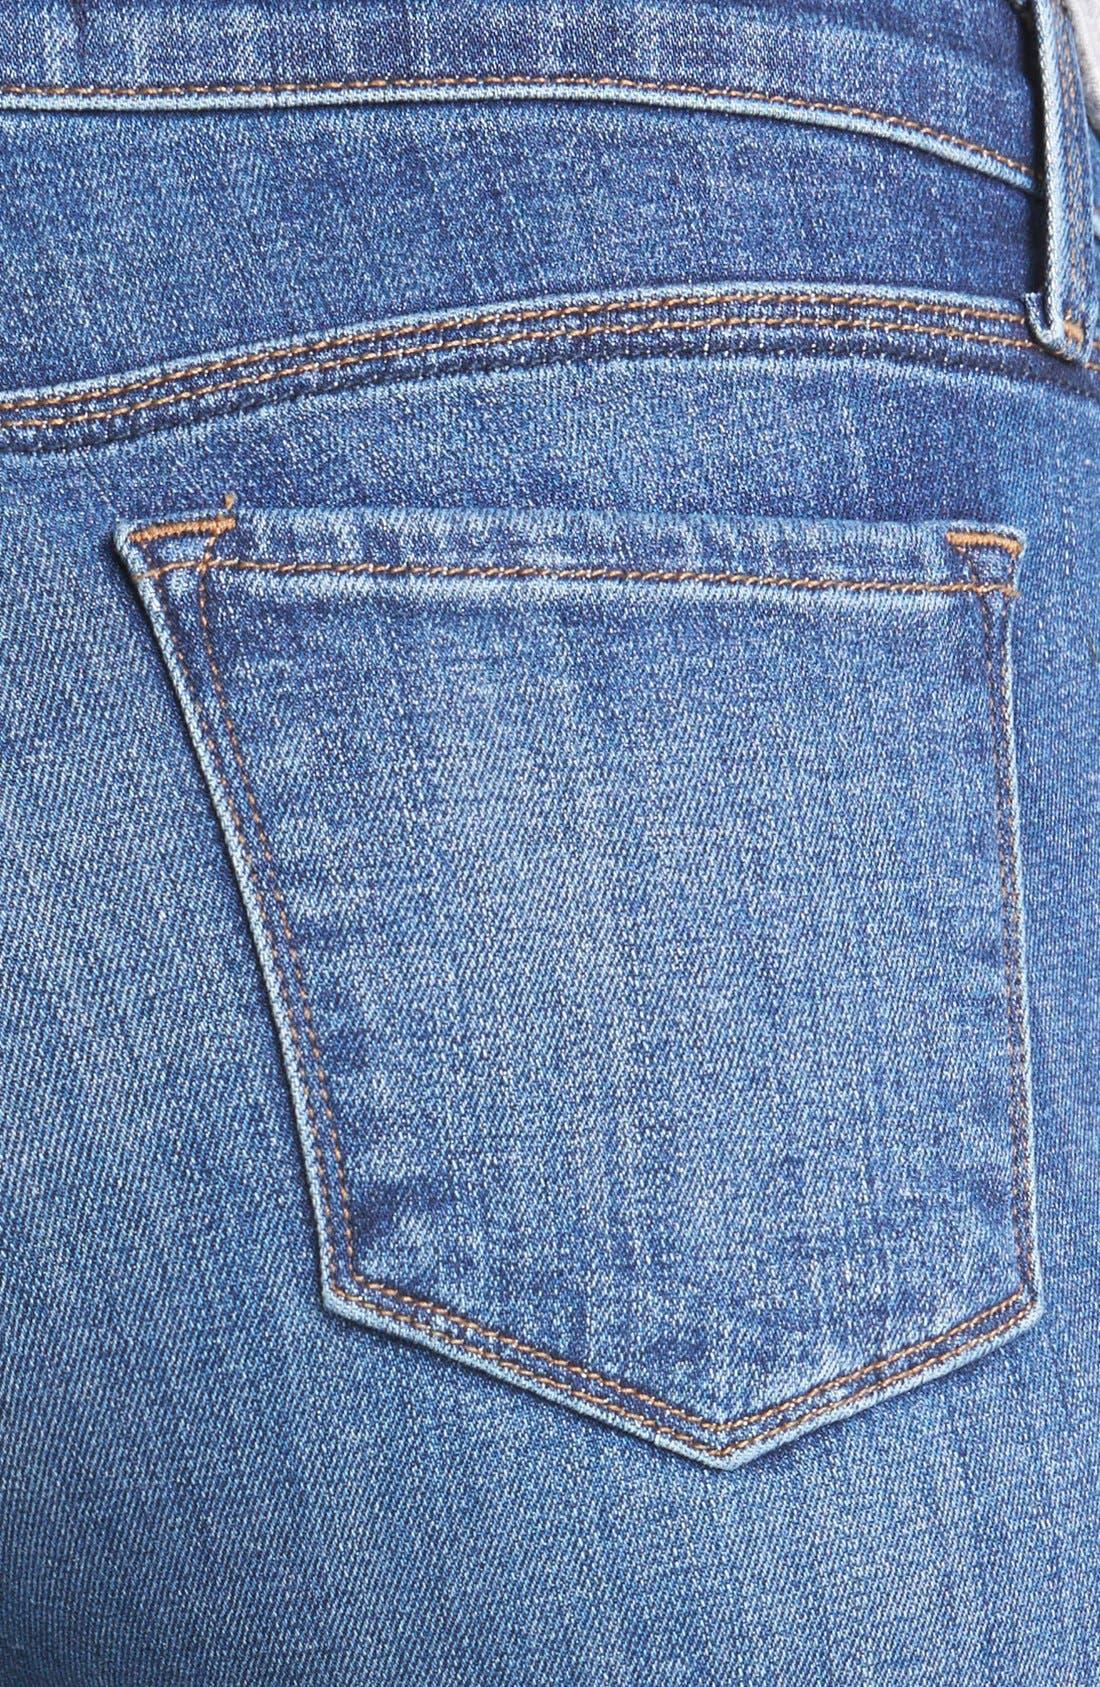 Alternate Image 3  - J Brand '620' Mid-Rise Skinny Jeans (Refuge)